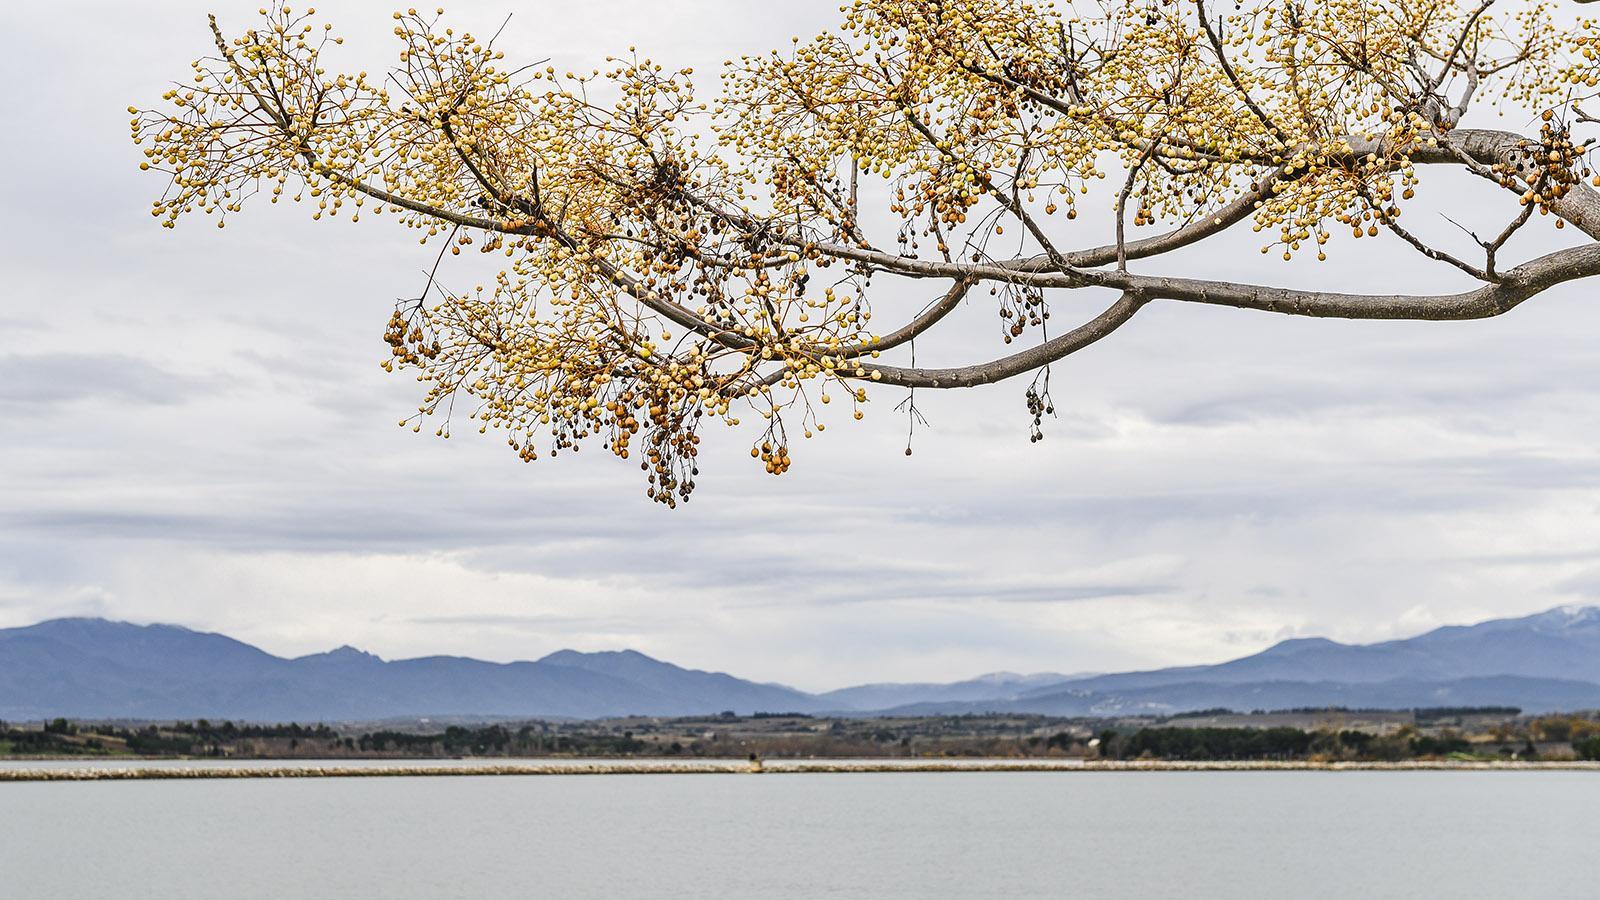 Lac de la Raho: Winter am Lac de la Raho. Foto: Hilke Maunder